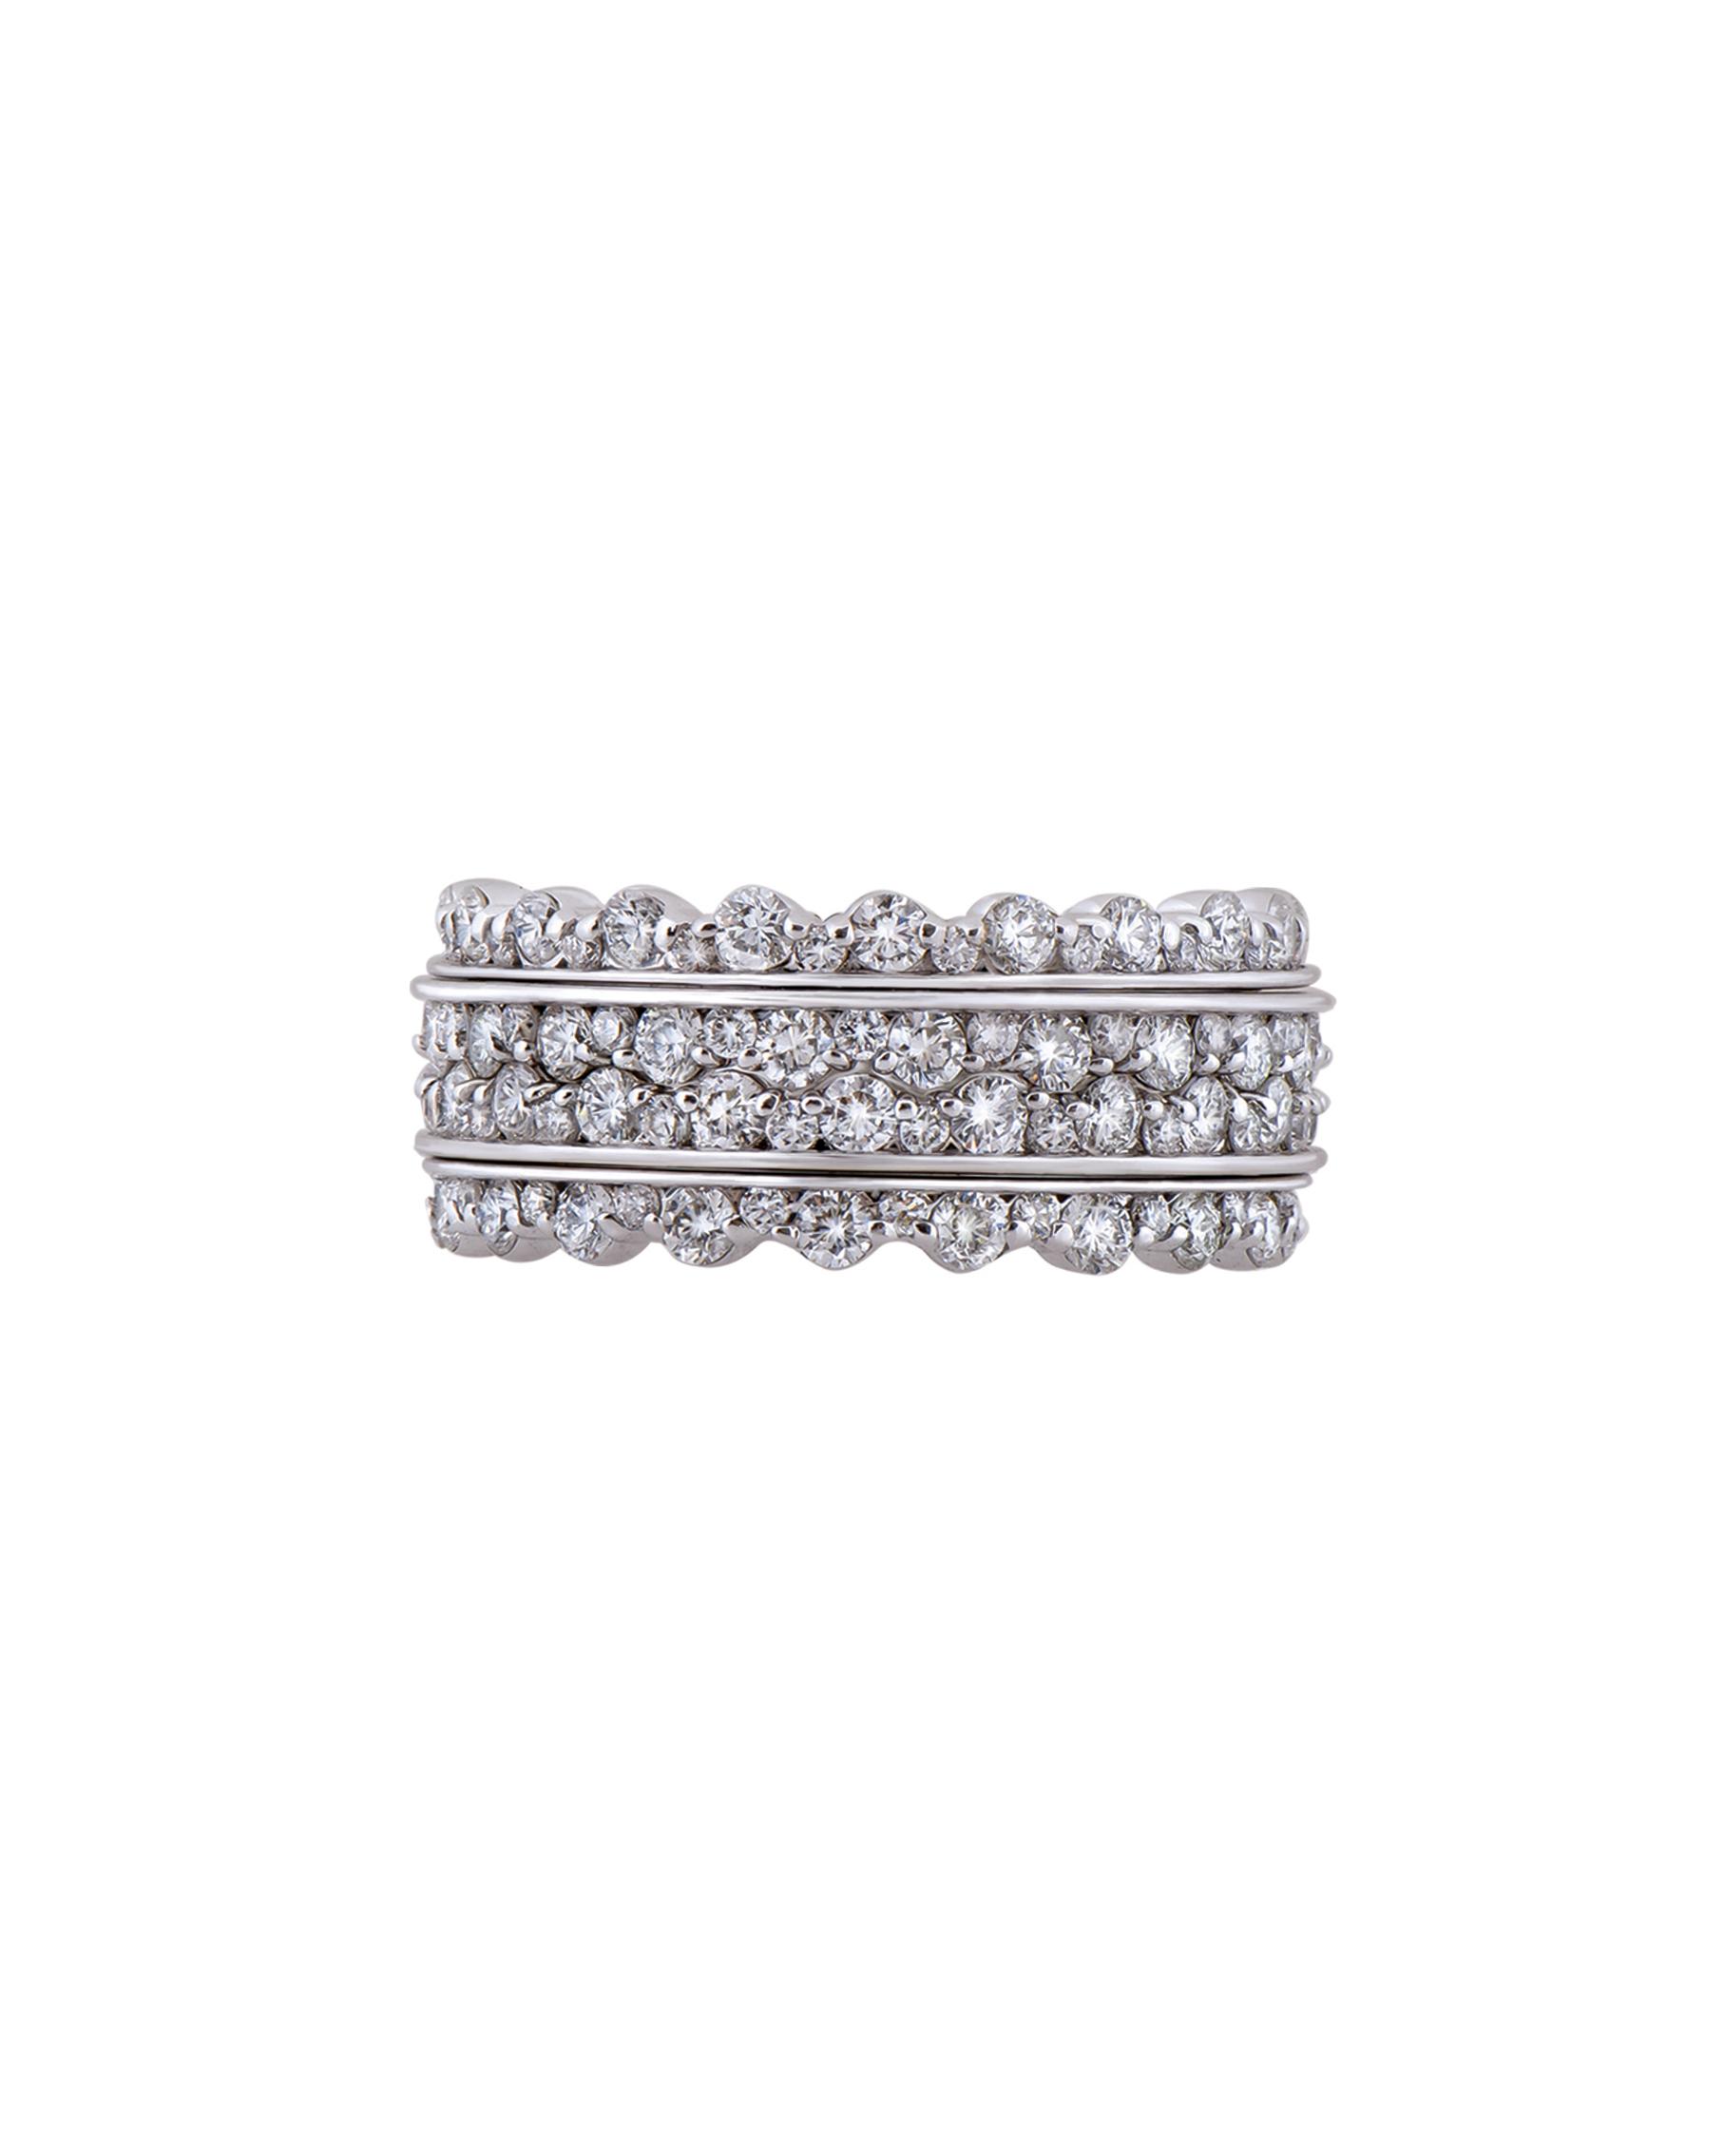 designer diamond bridal jewelry-1-5.jpg